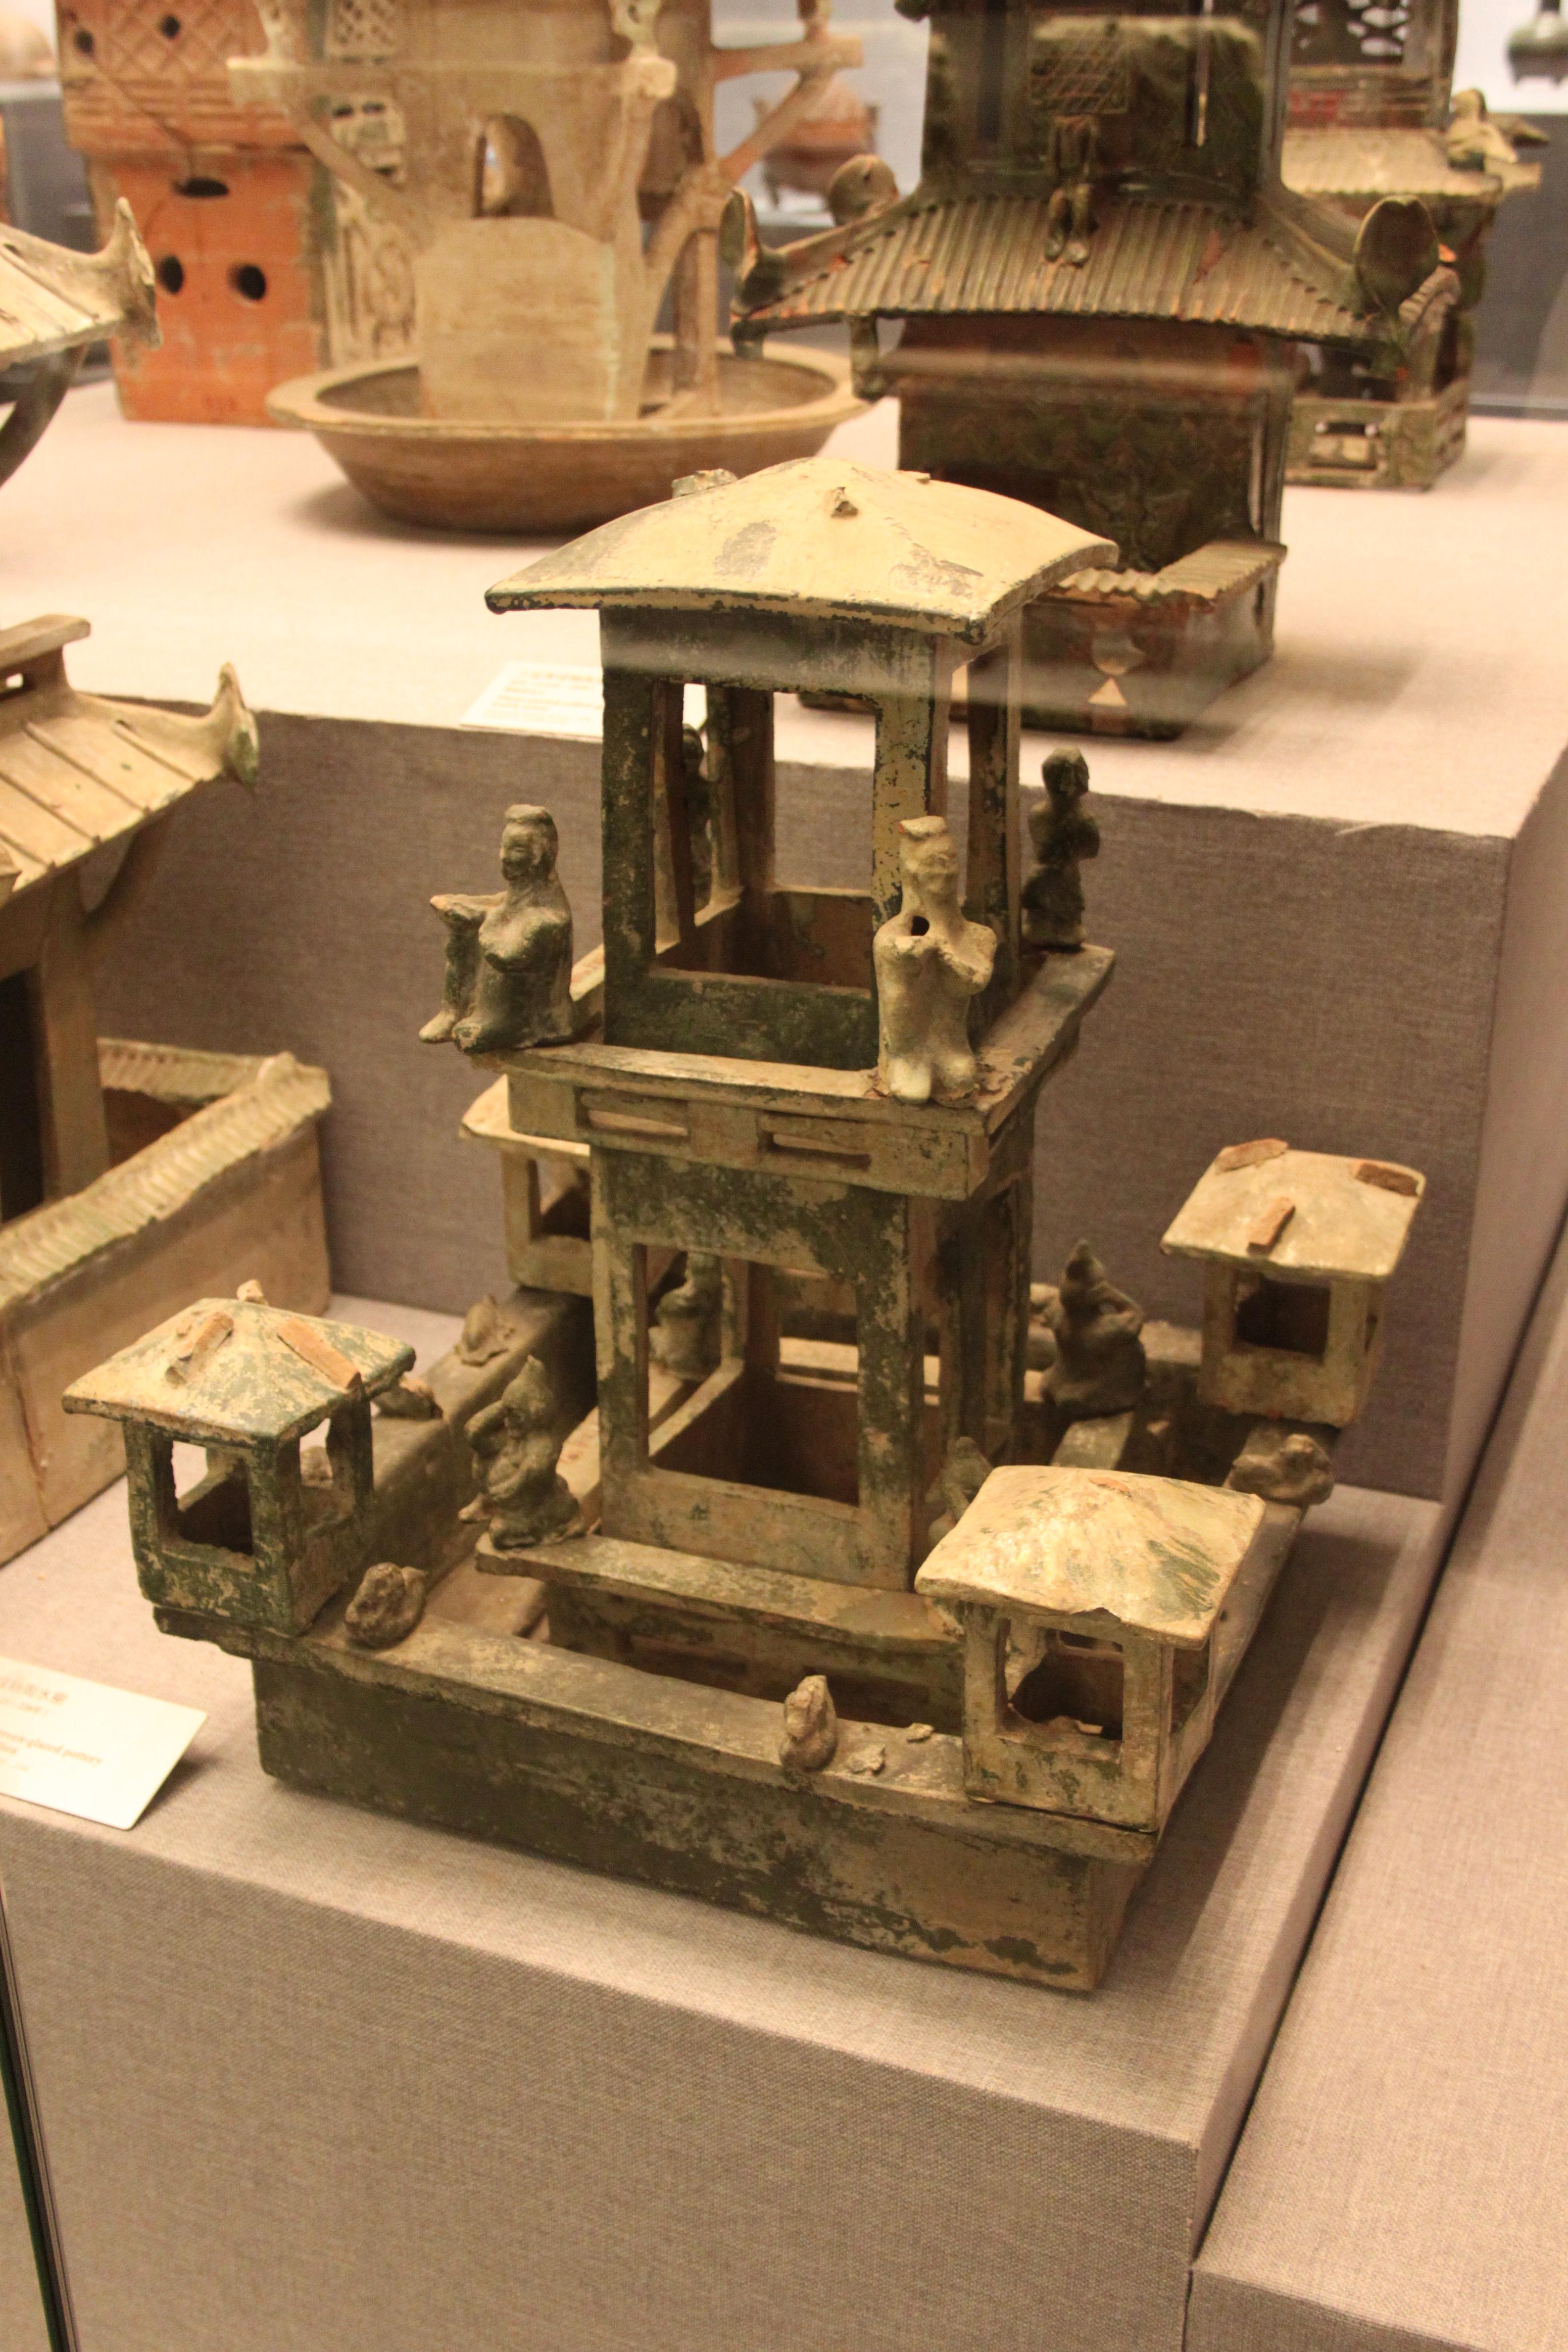 https://upload.wikimedia.org/wikipedia/commons/e/ec/Eastern_Han_Pottery_Tower_-_3.jpg